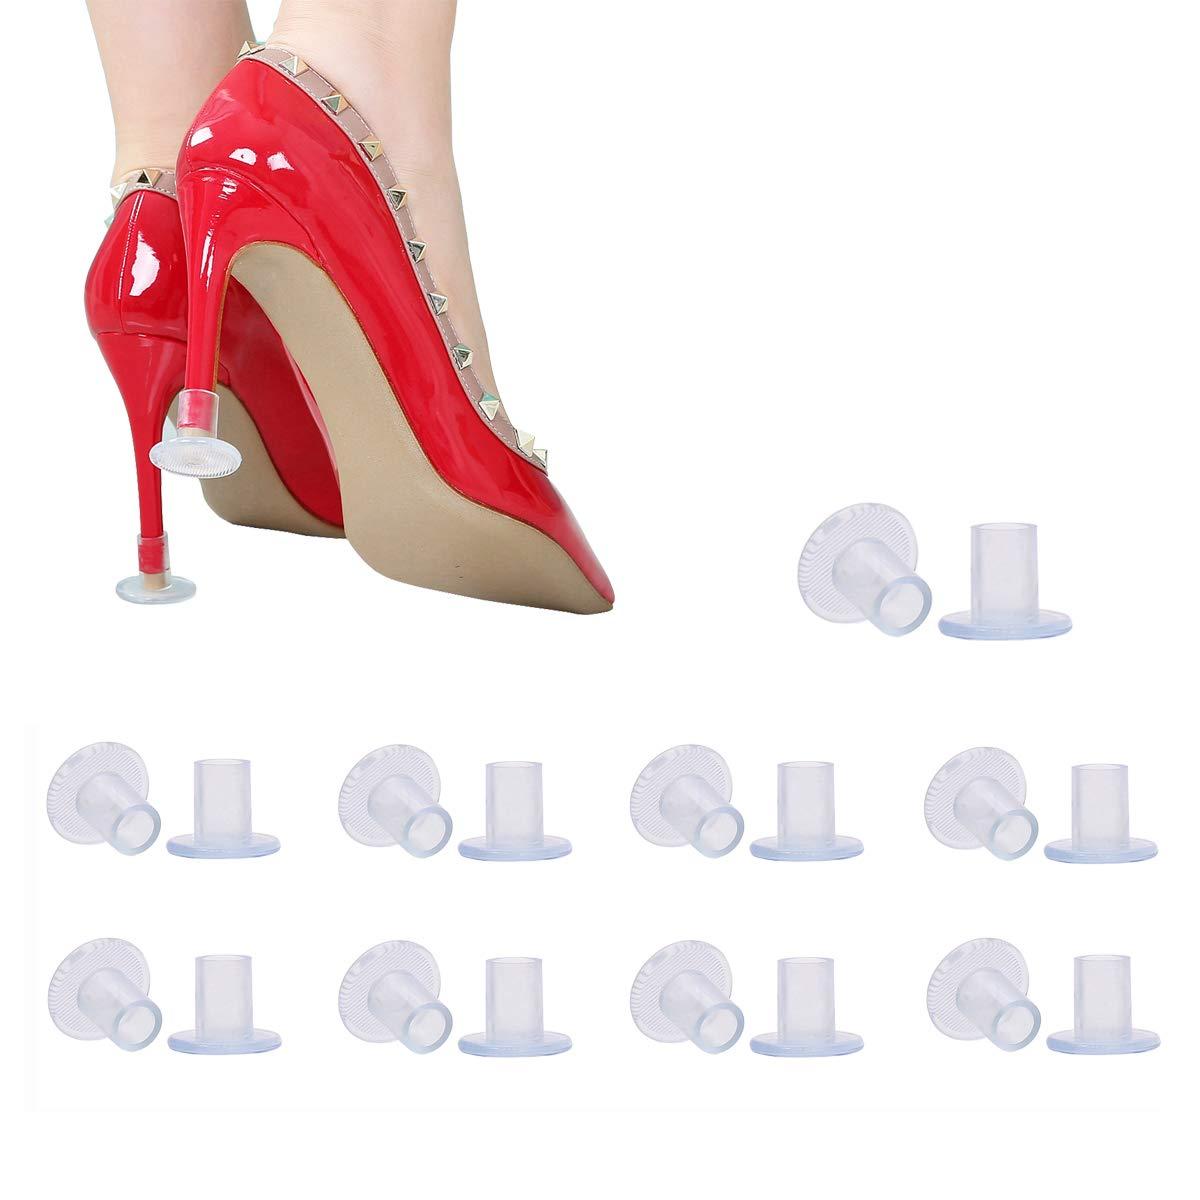 ba84c5228cbb2 Amazon.com: Heel Hunks Clear-Glass 7 Sizes 7 Pair Set Heel ...